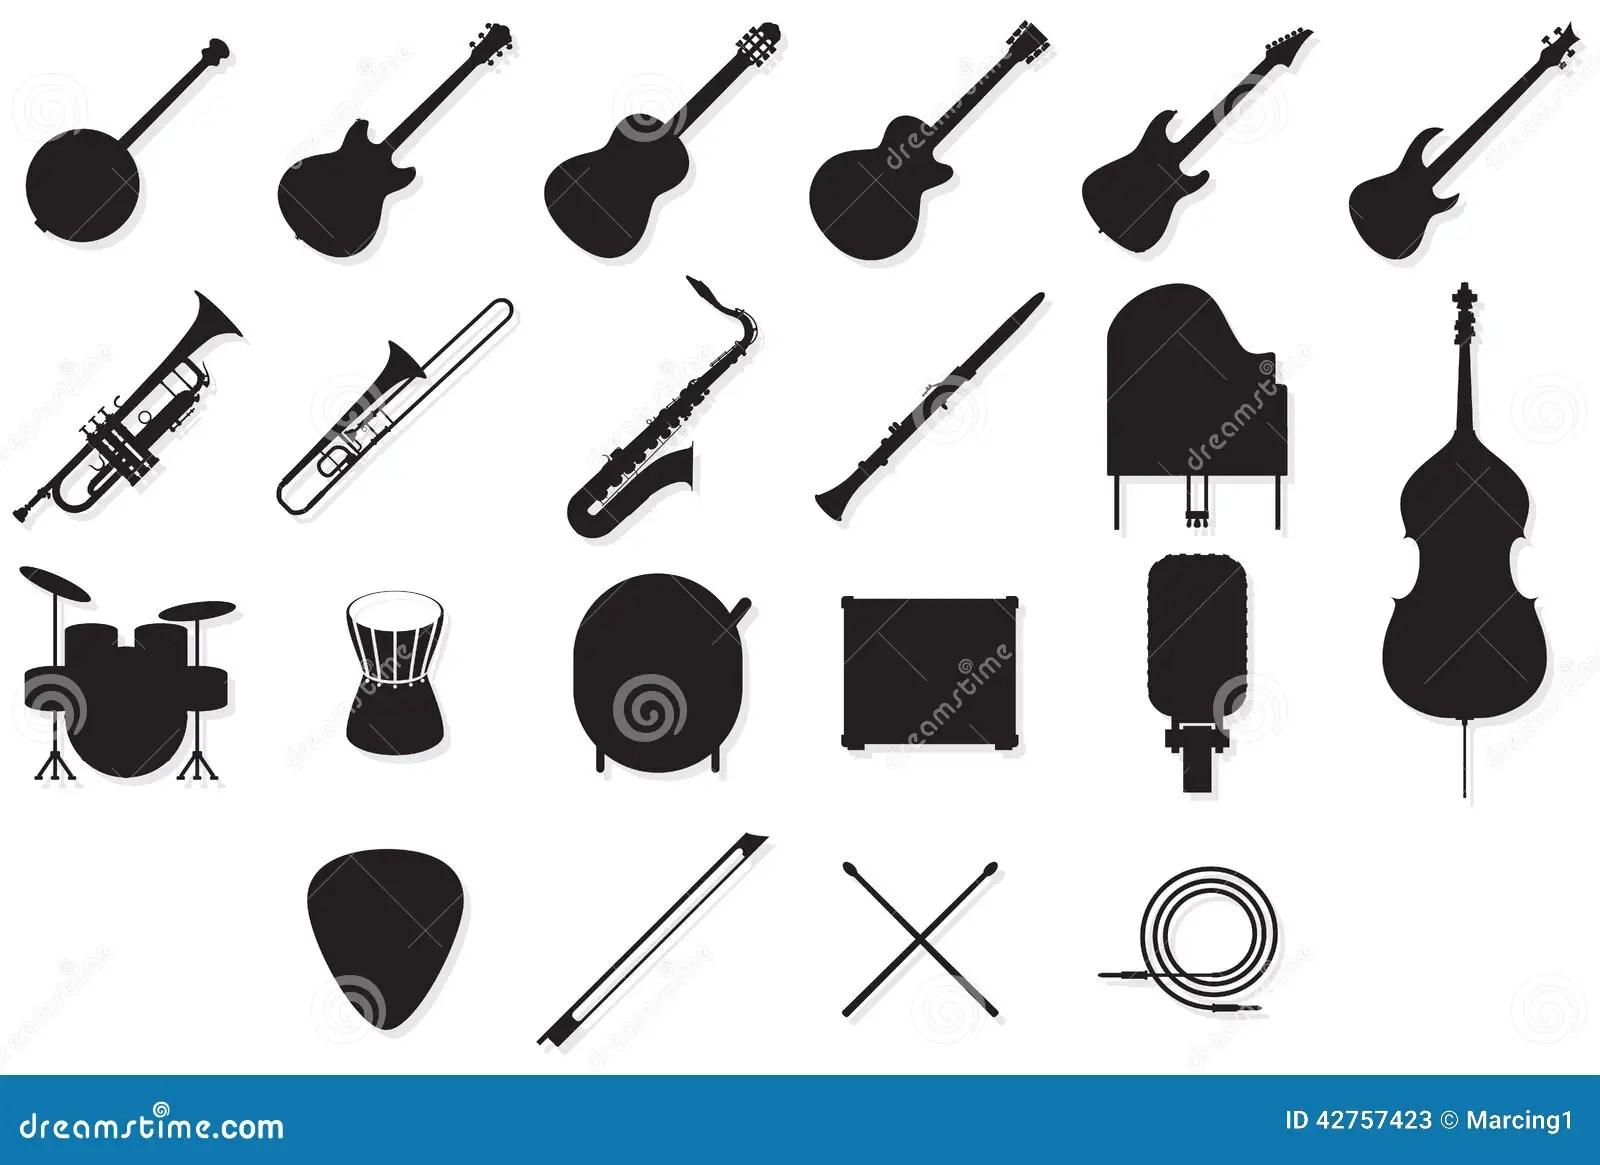 Instruments Outlines Set Stock Vector